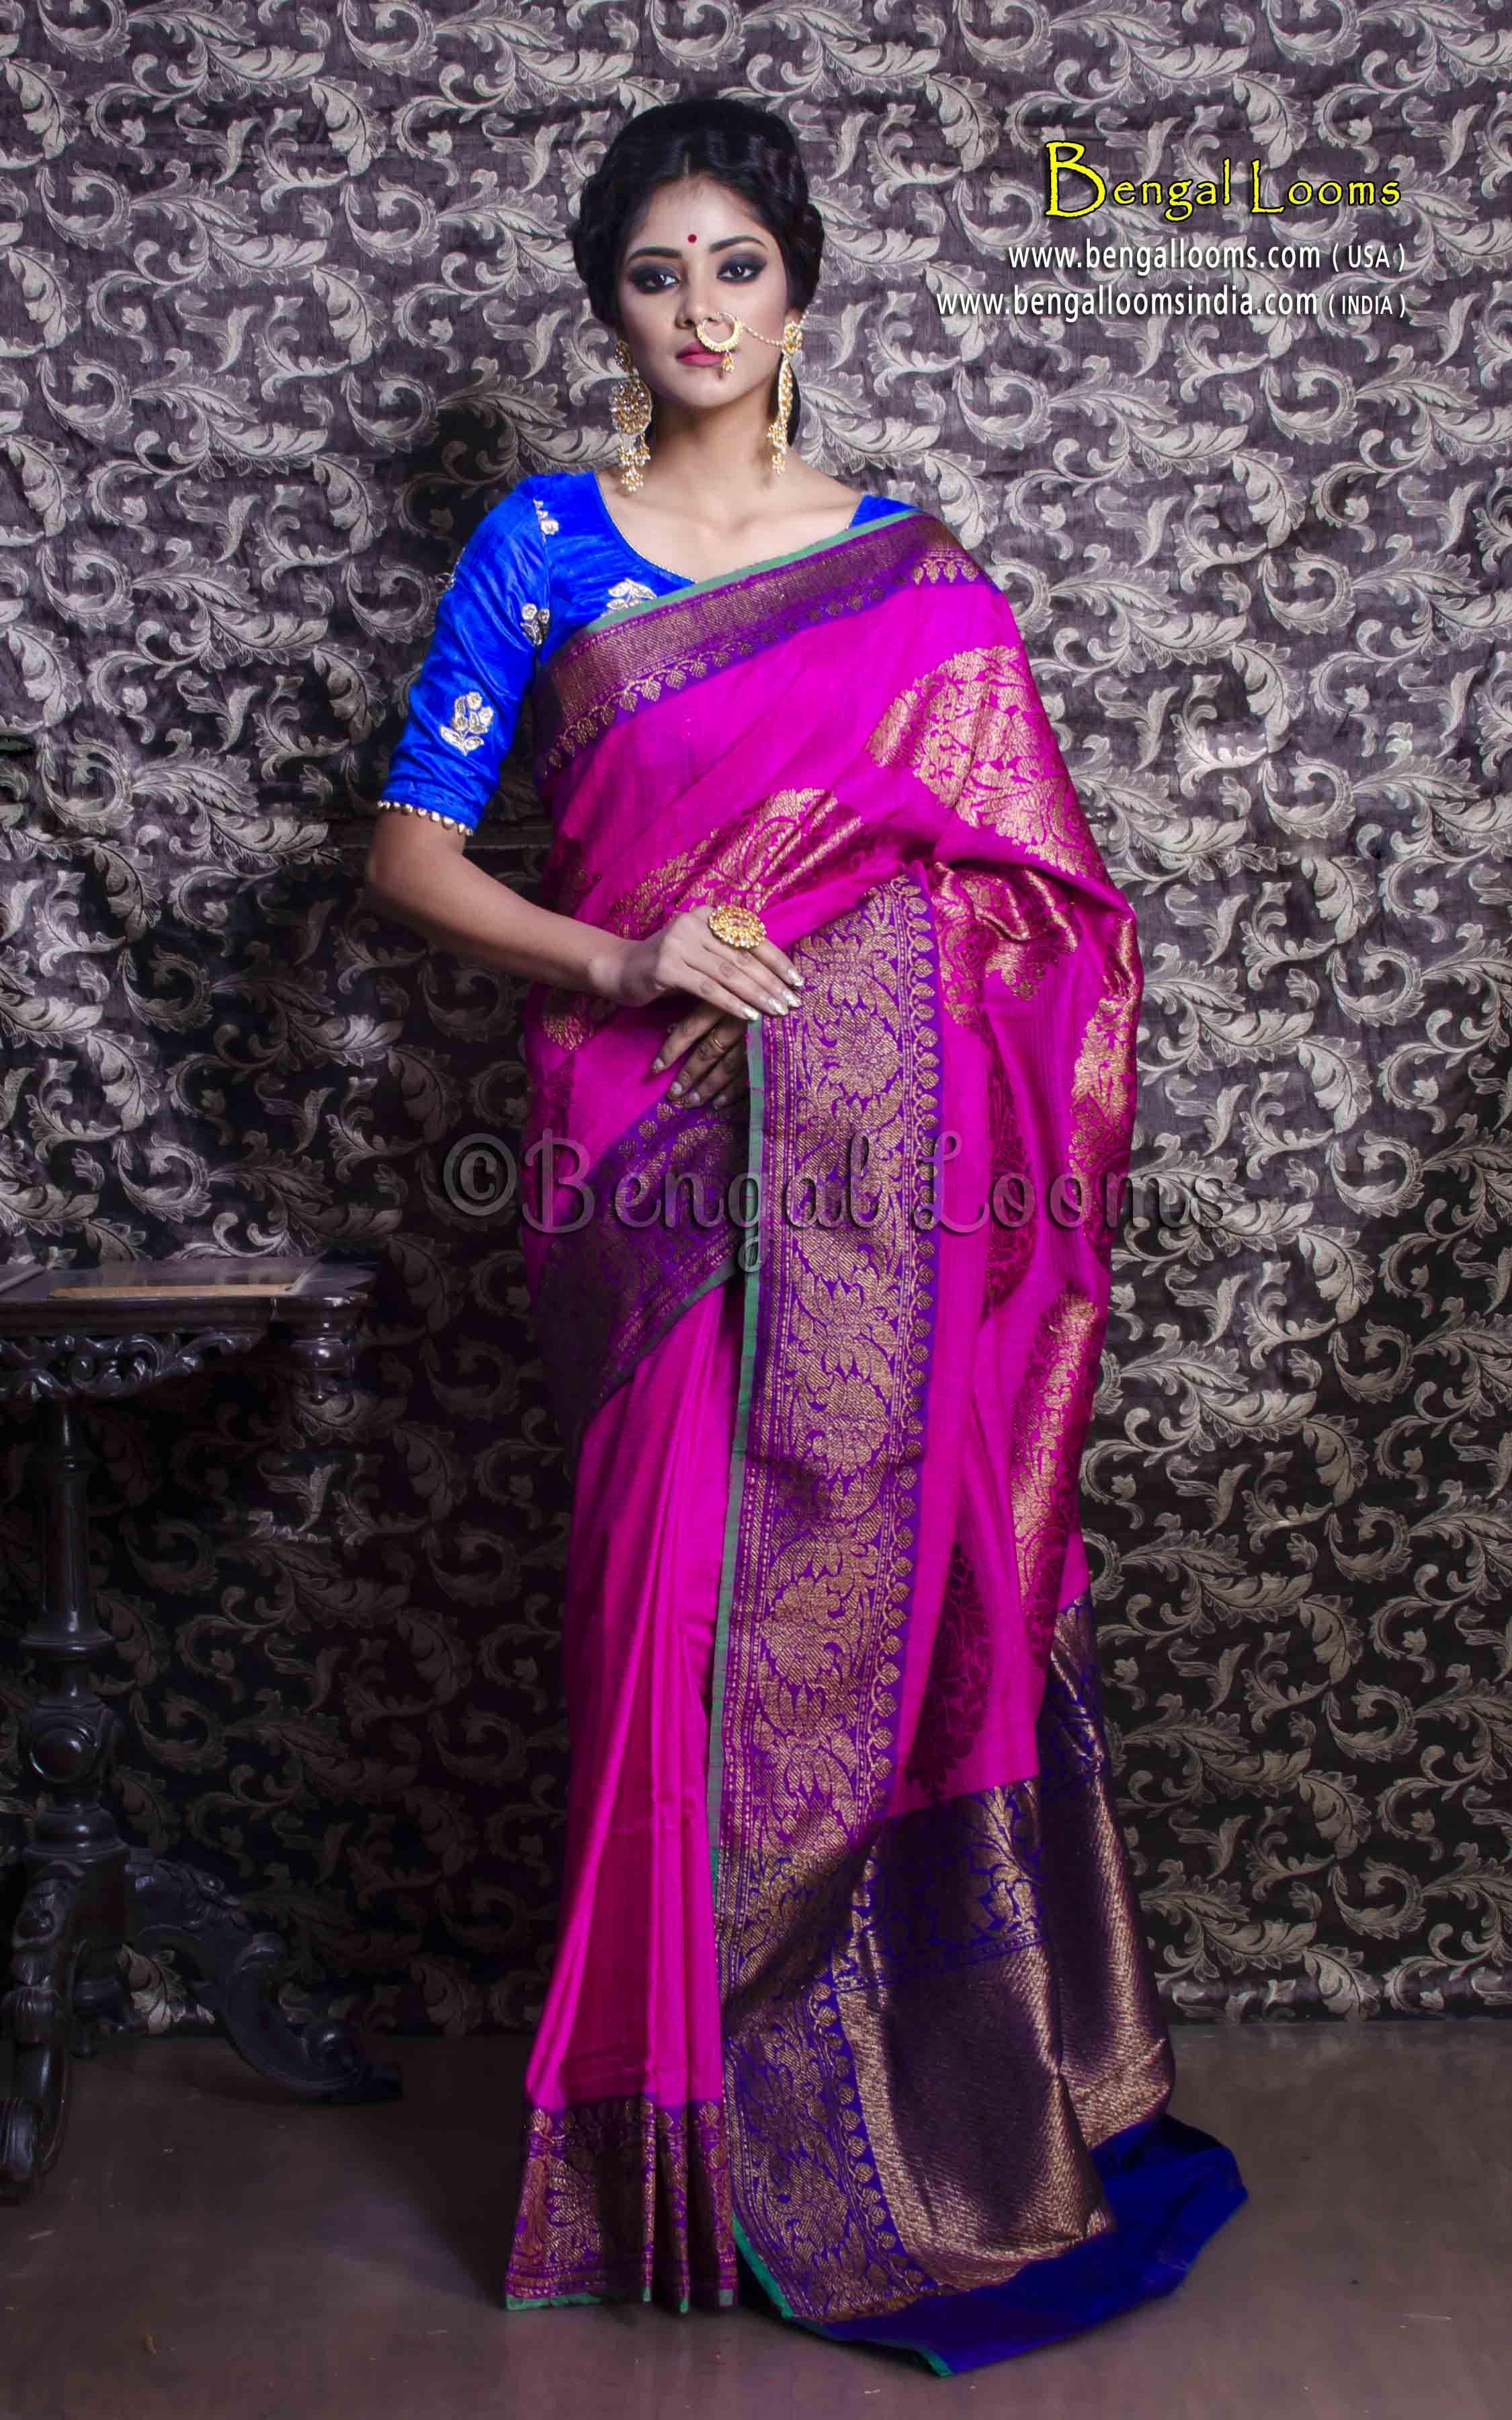 dc07723541 Pure Handloom Tussar Silk Banarasi Saree in Hot Pink and Blue ...